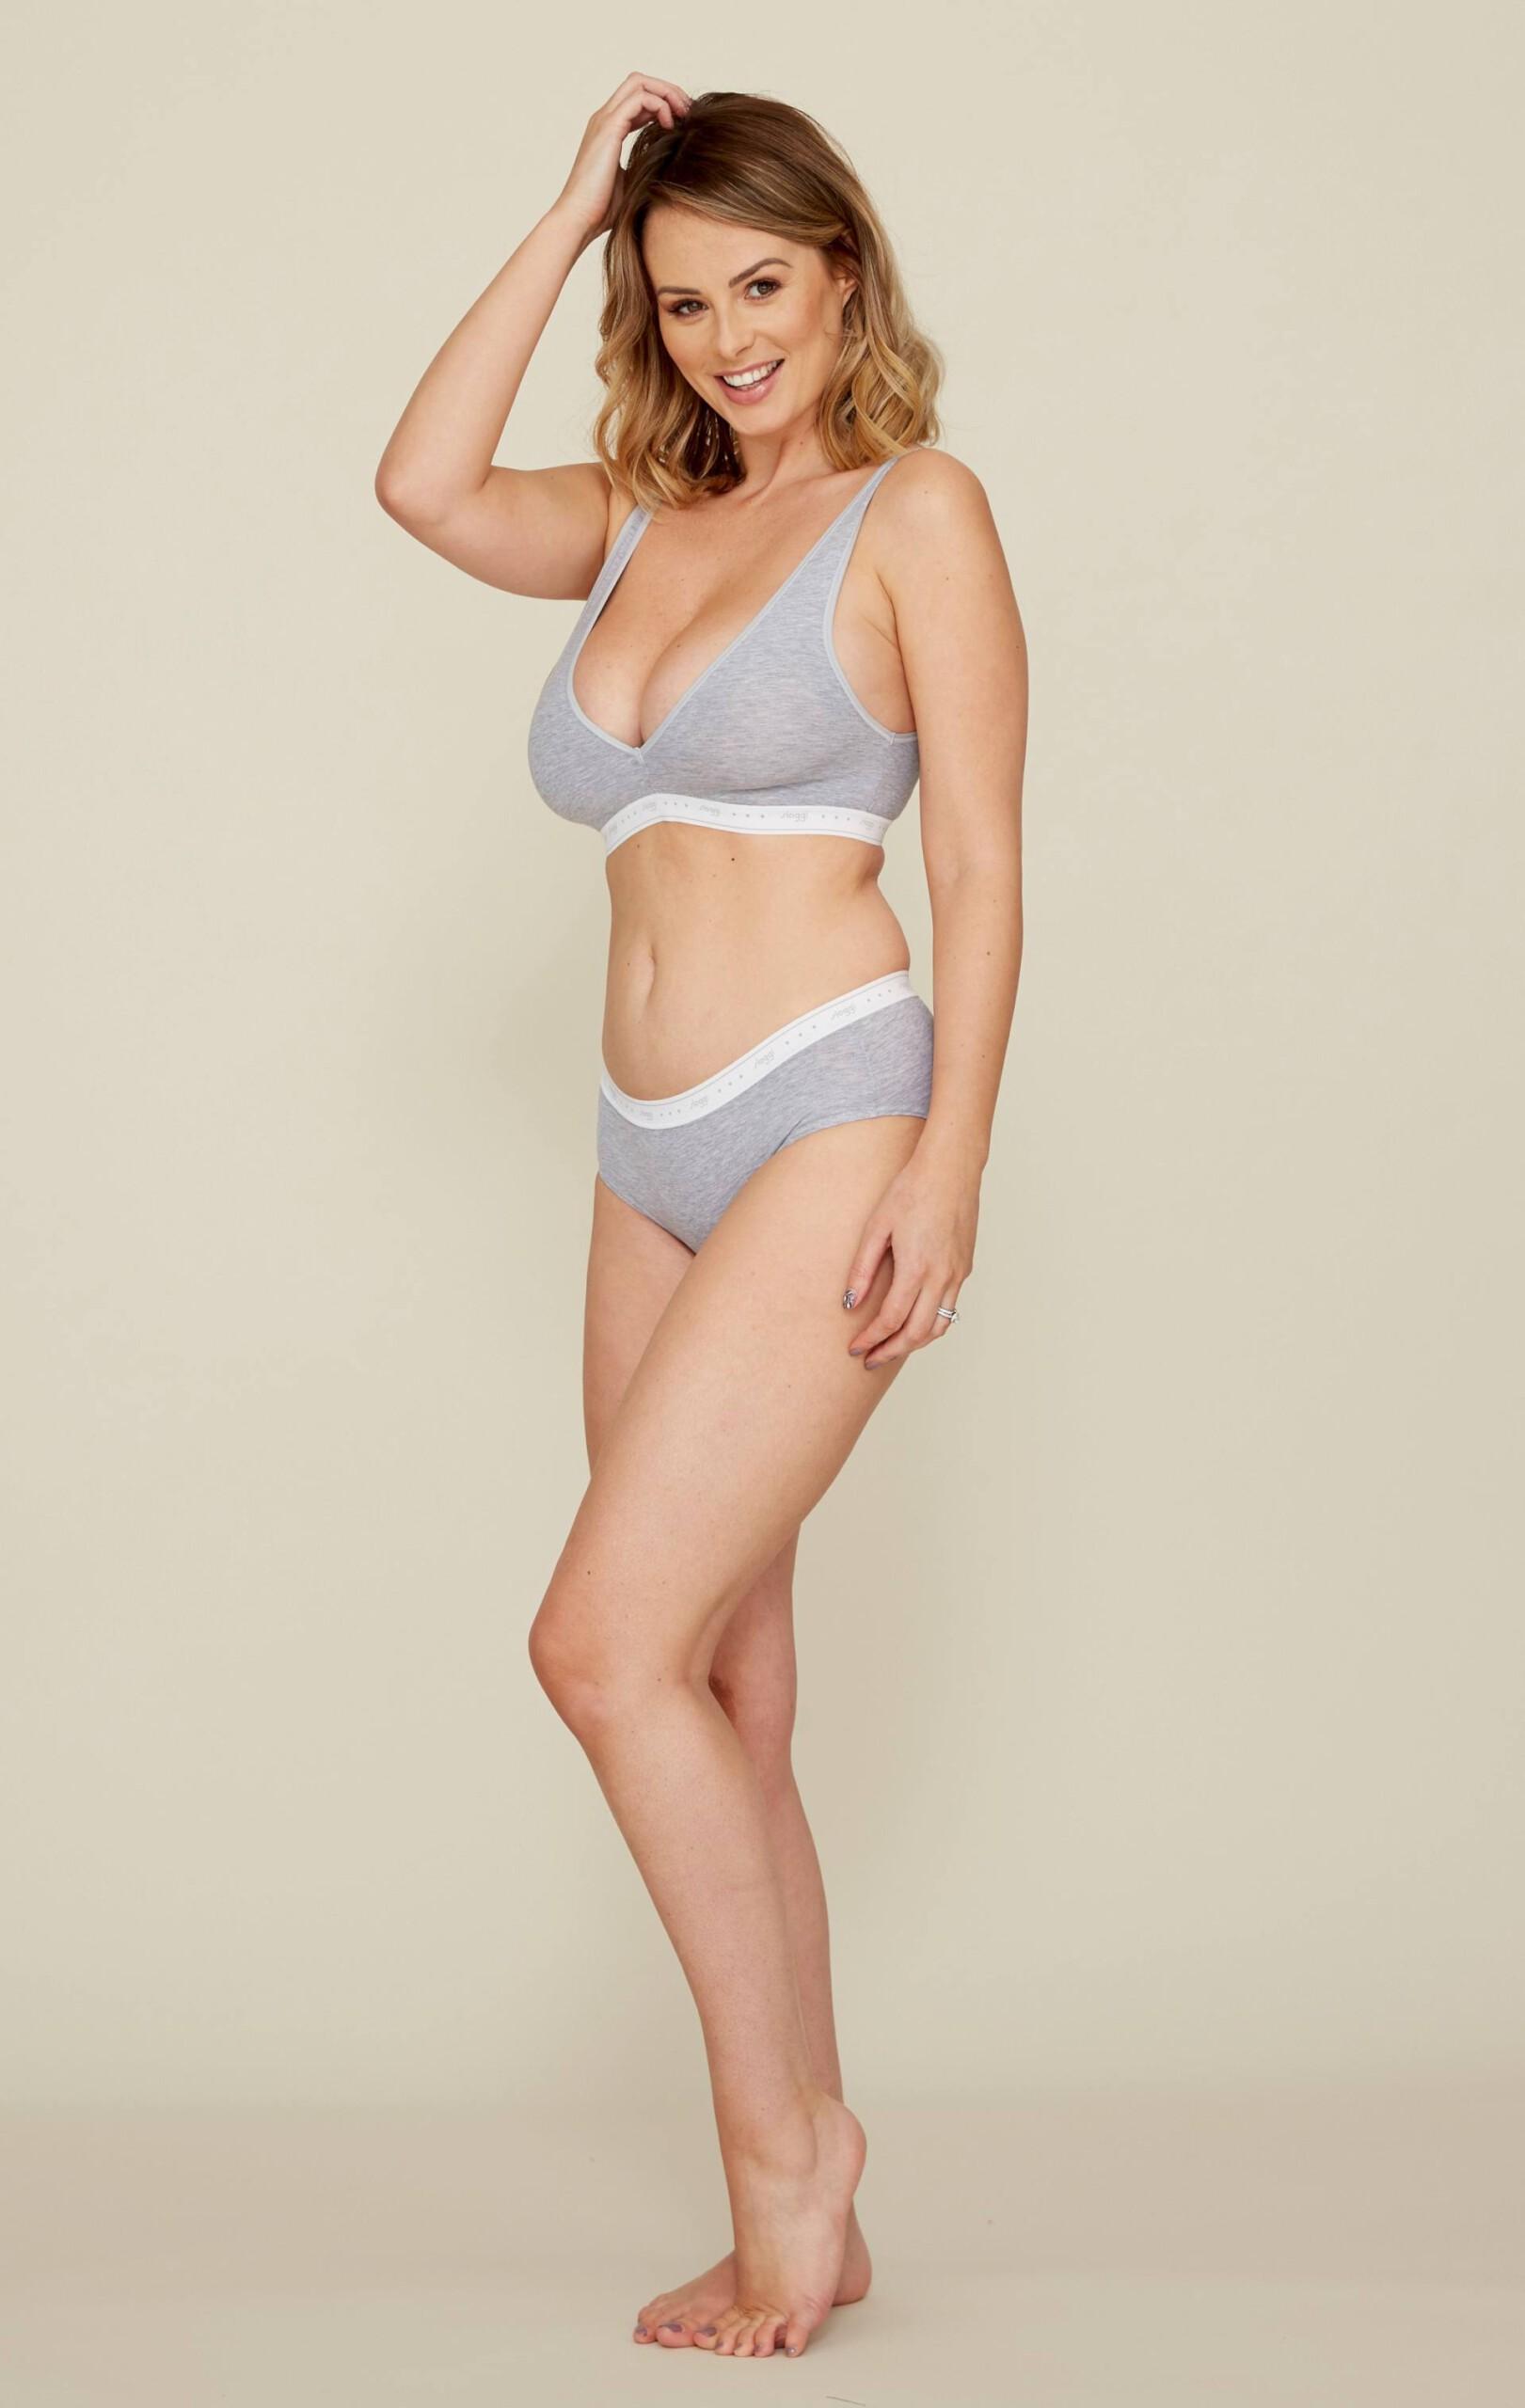 Rhian Sugden Huge Sexy Boobs